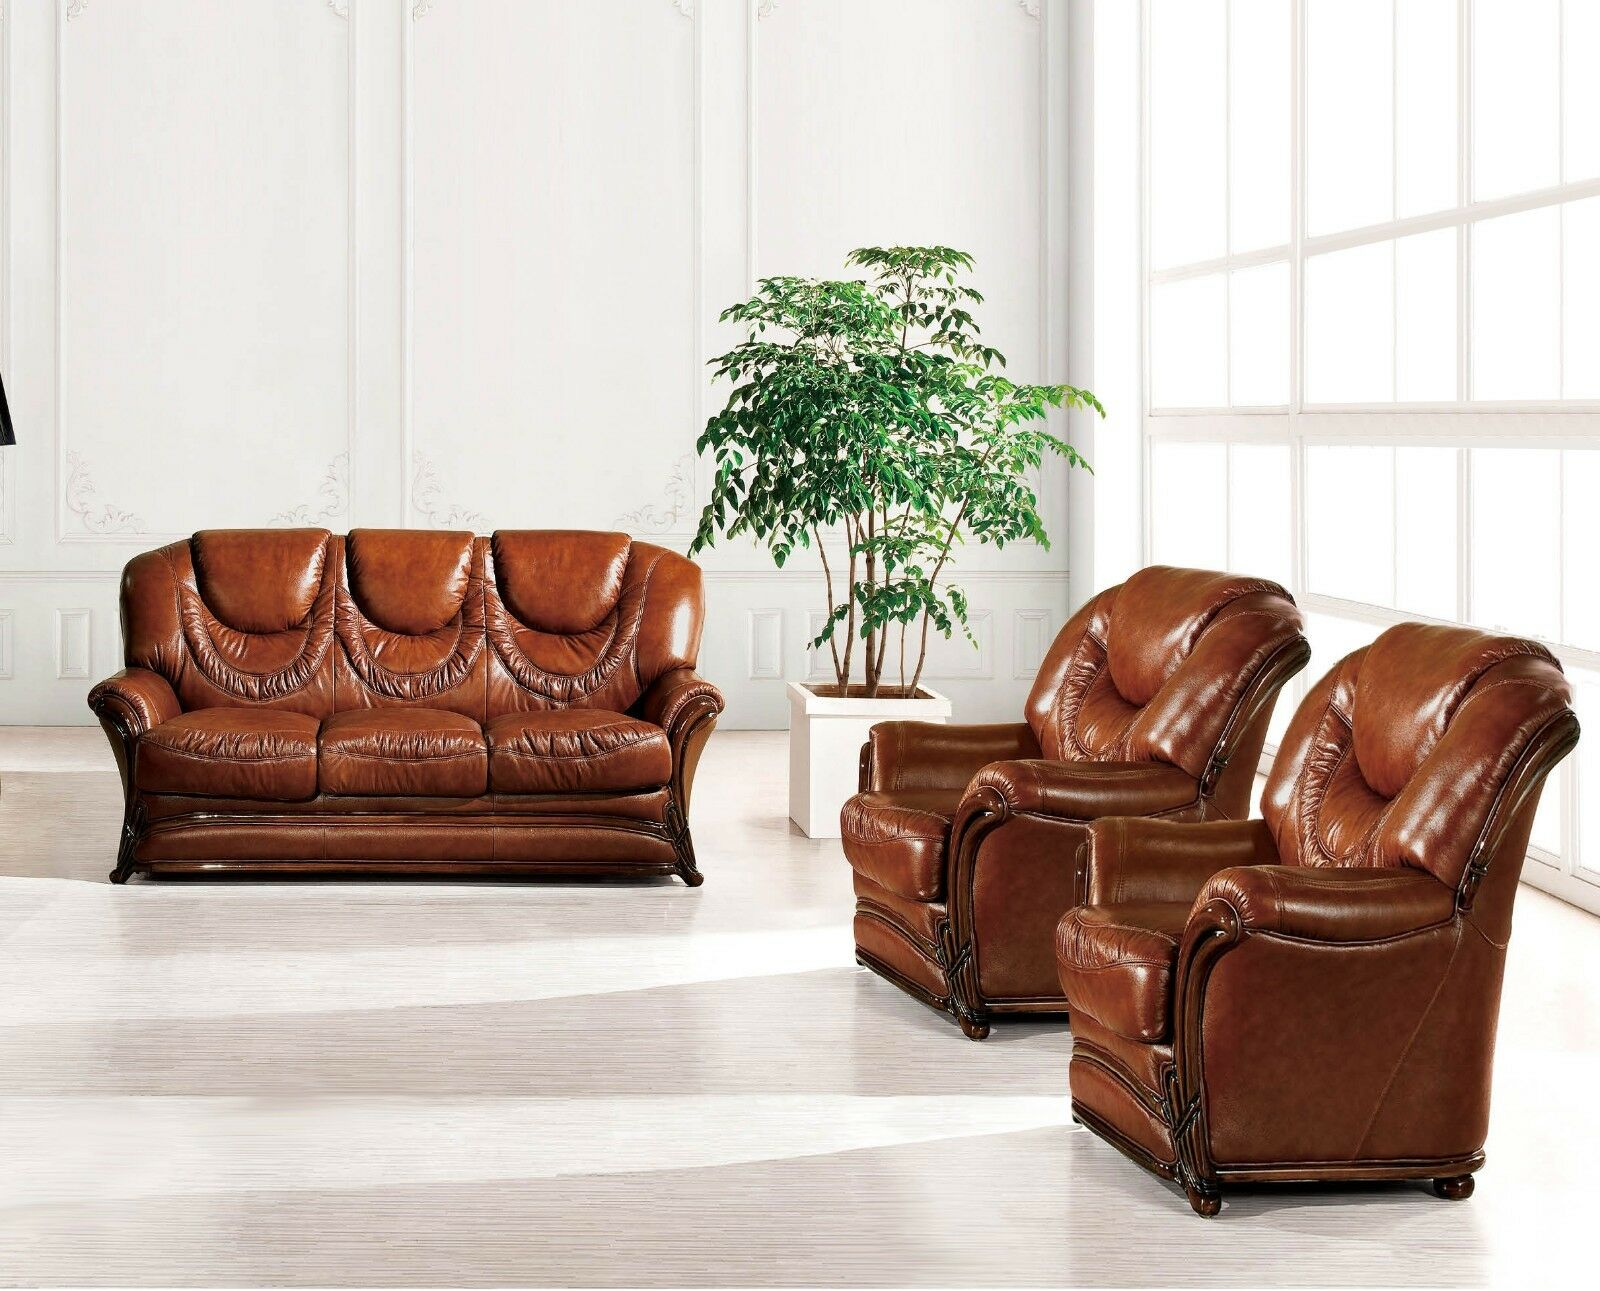 Bella Luxury Brown Italian Leather Sleeper Sofa 2 Chairs 3pc Set Carved Wood